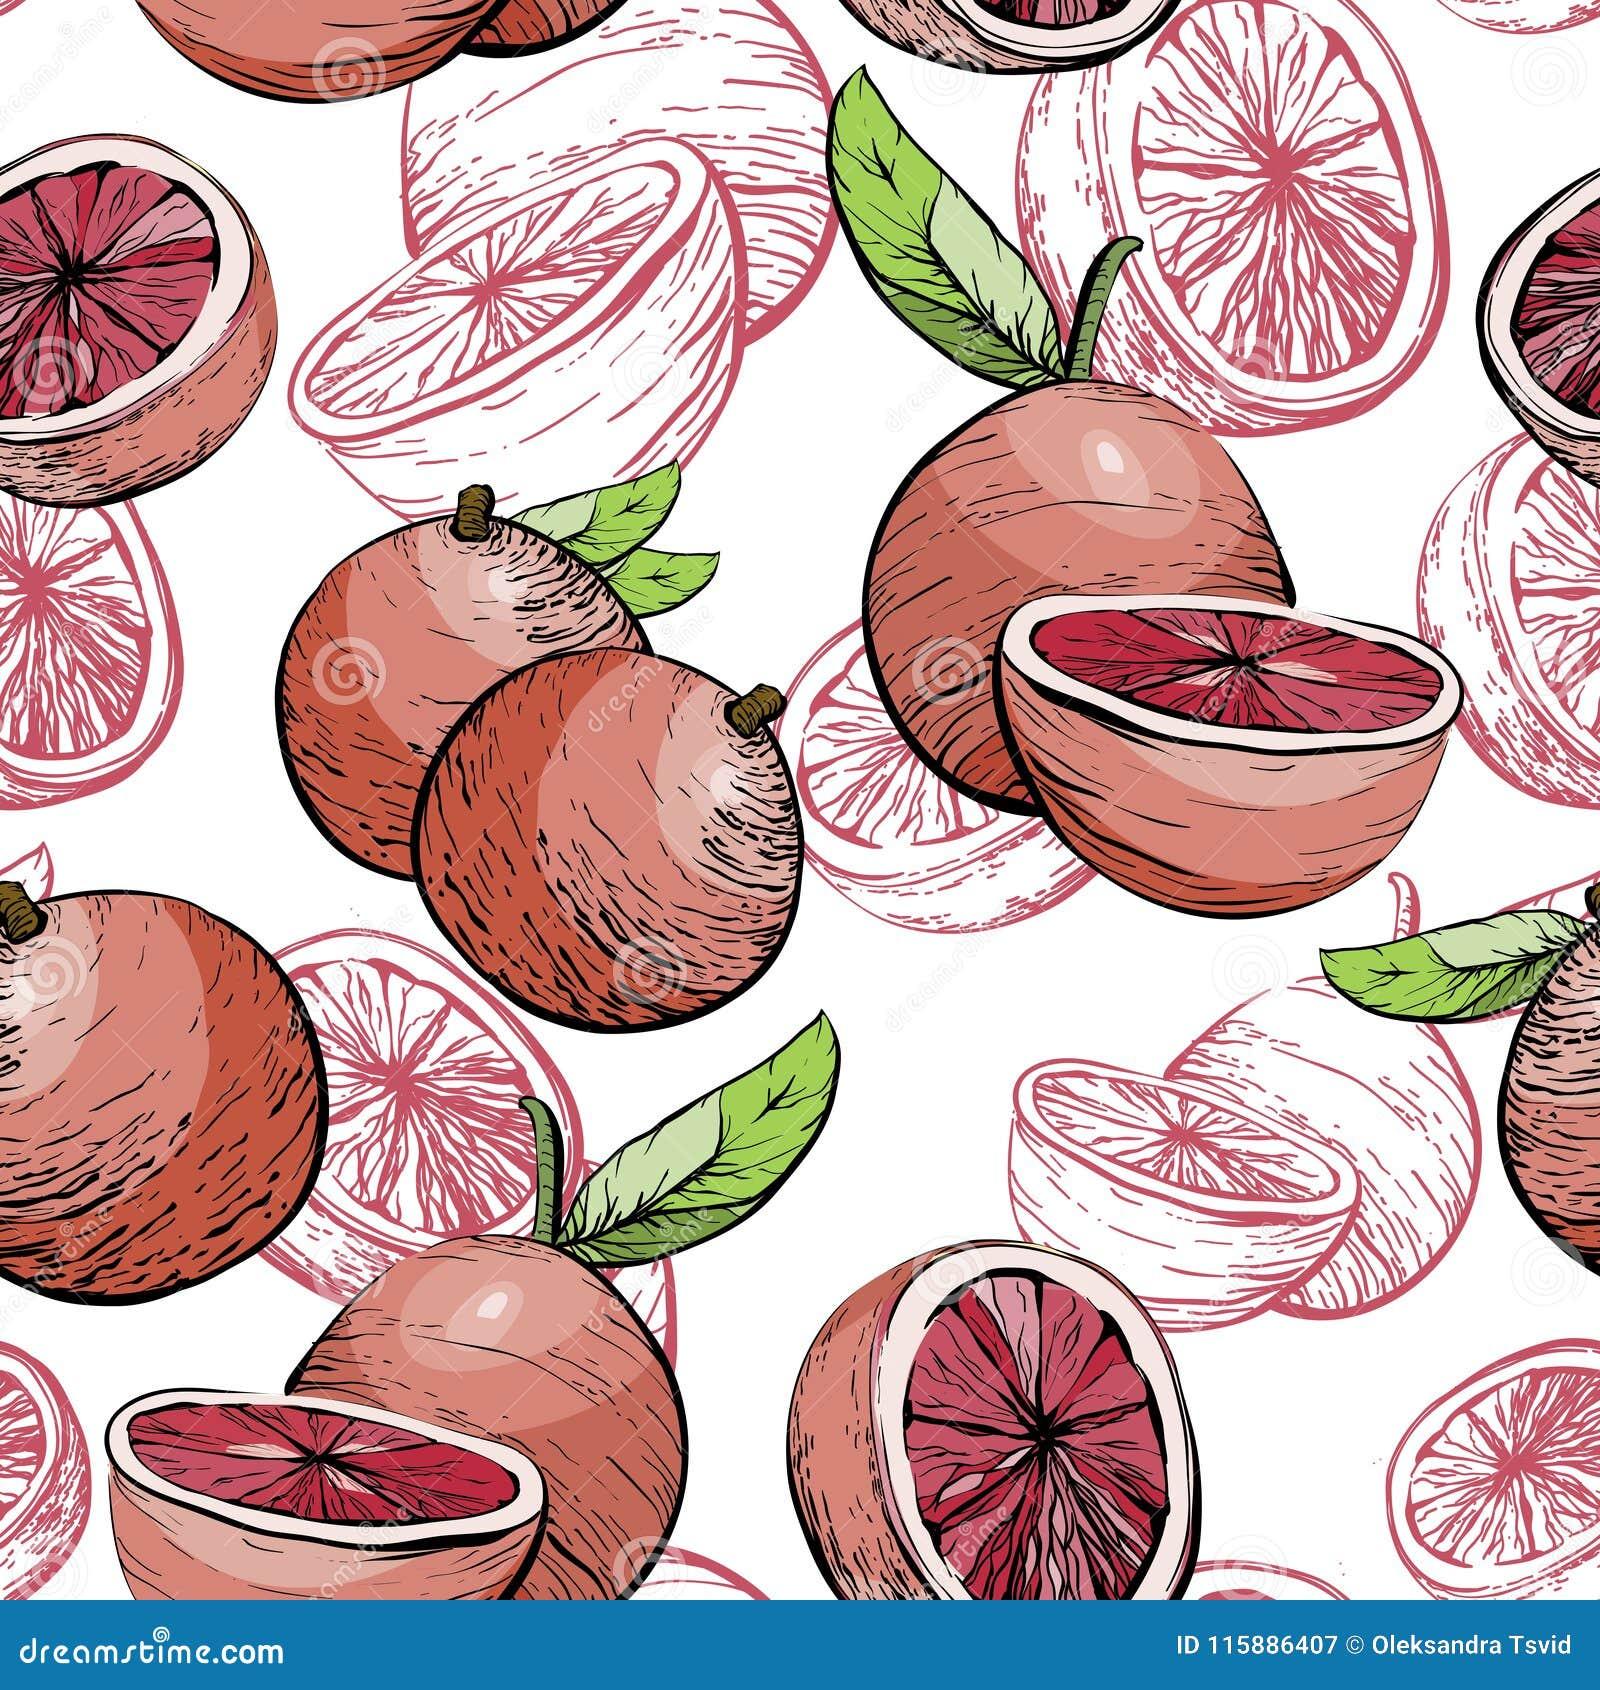 Grapefruit pattern. Seamless background. Citrus fruit Juicy background . Citrus seamless pattern with grapefruit.